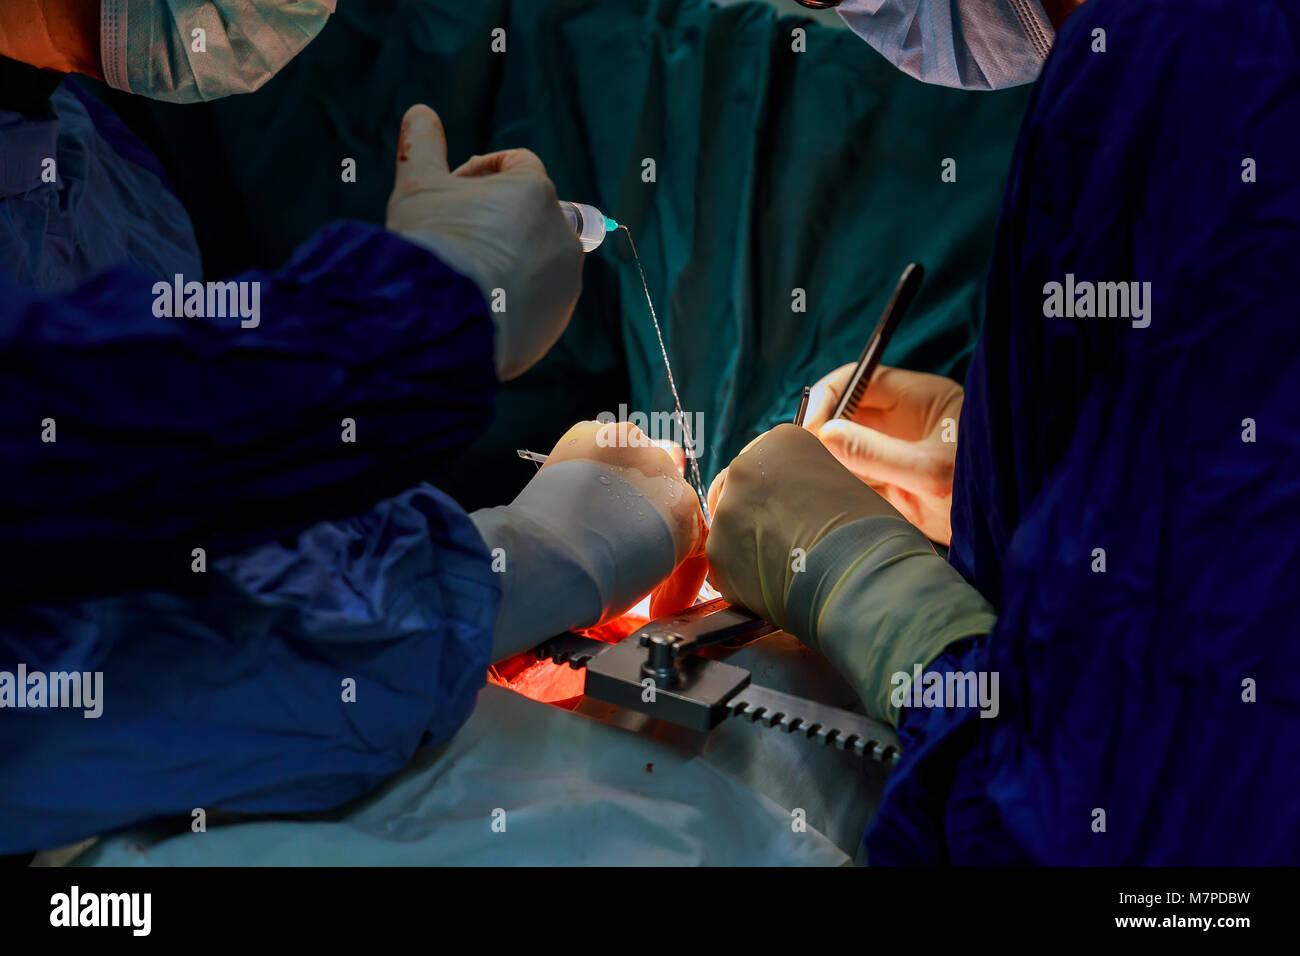 Heart surgery. Open heart surgery. Coronary artery bypass surger in operating room - Stock Image